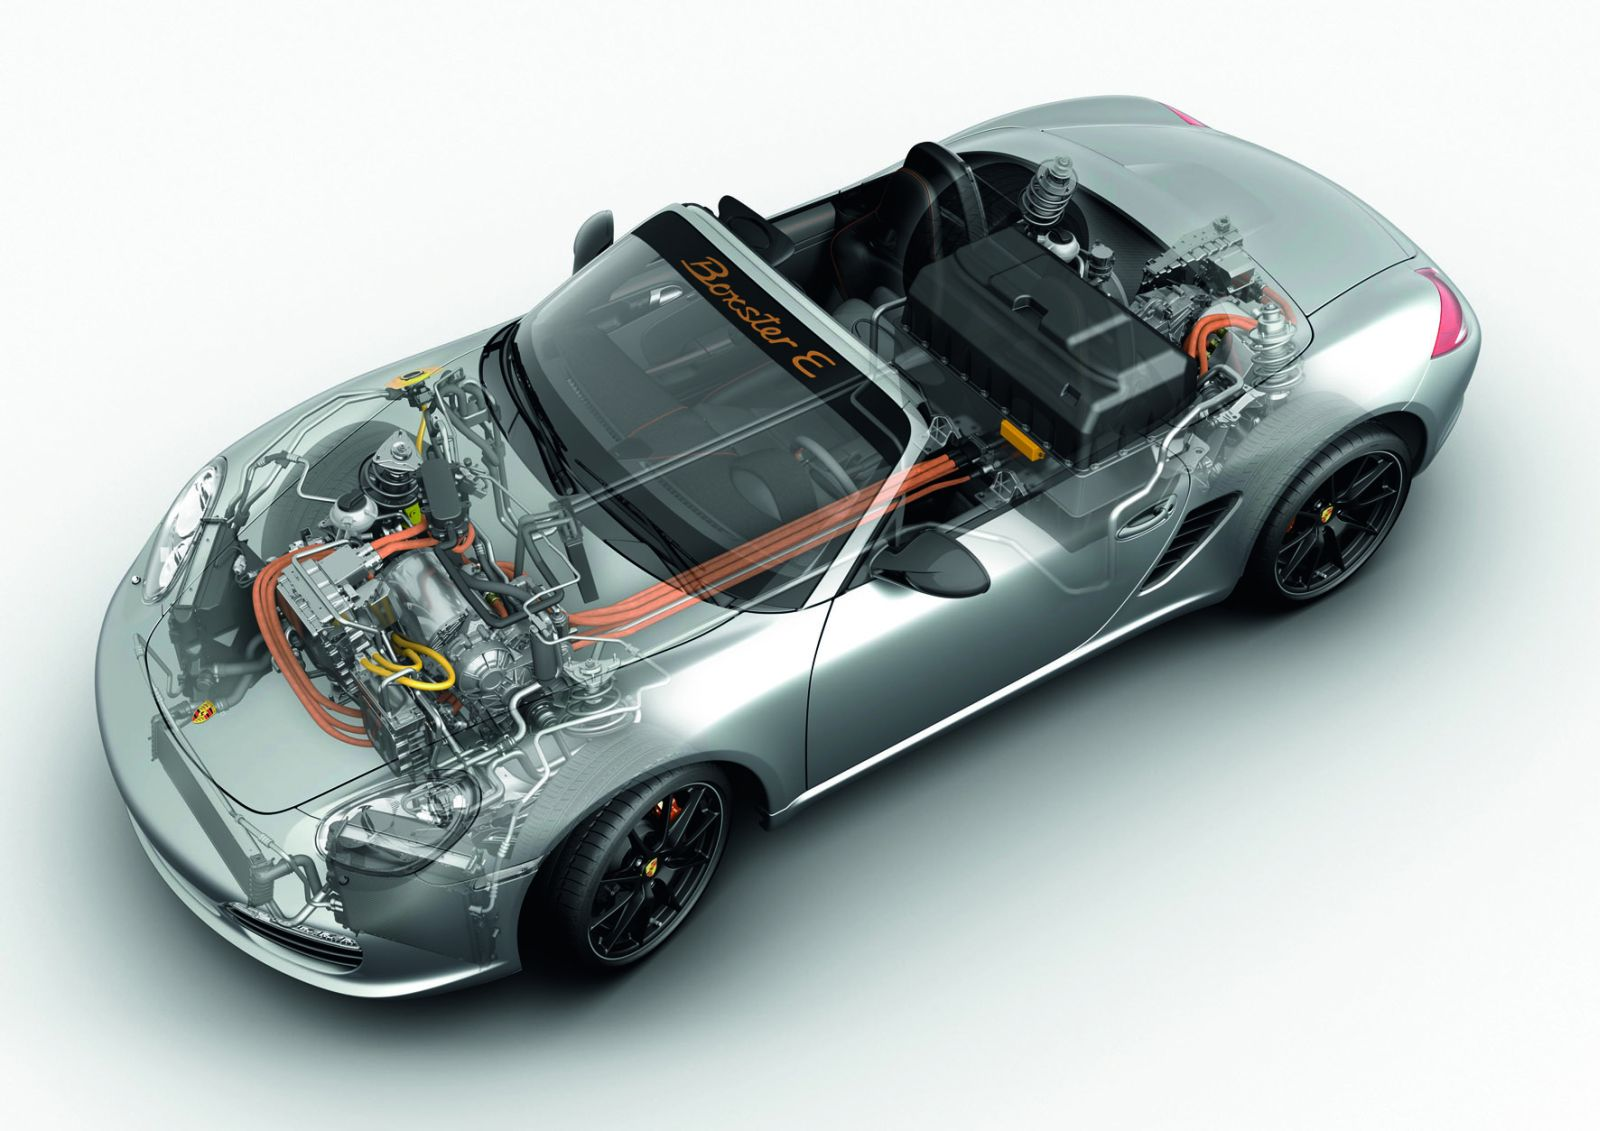 Porsche Weitere Themen Boxster E Small on Engine Cutaway Diagram